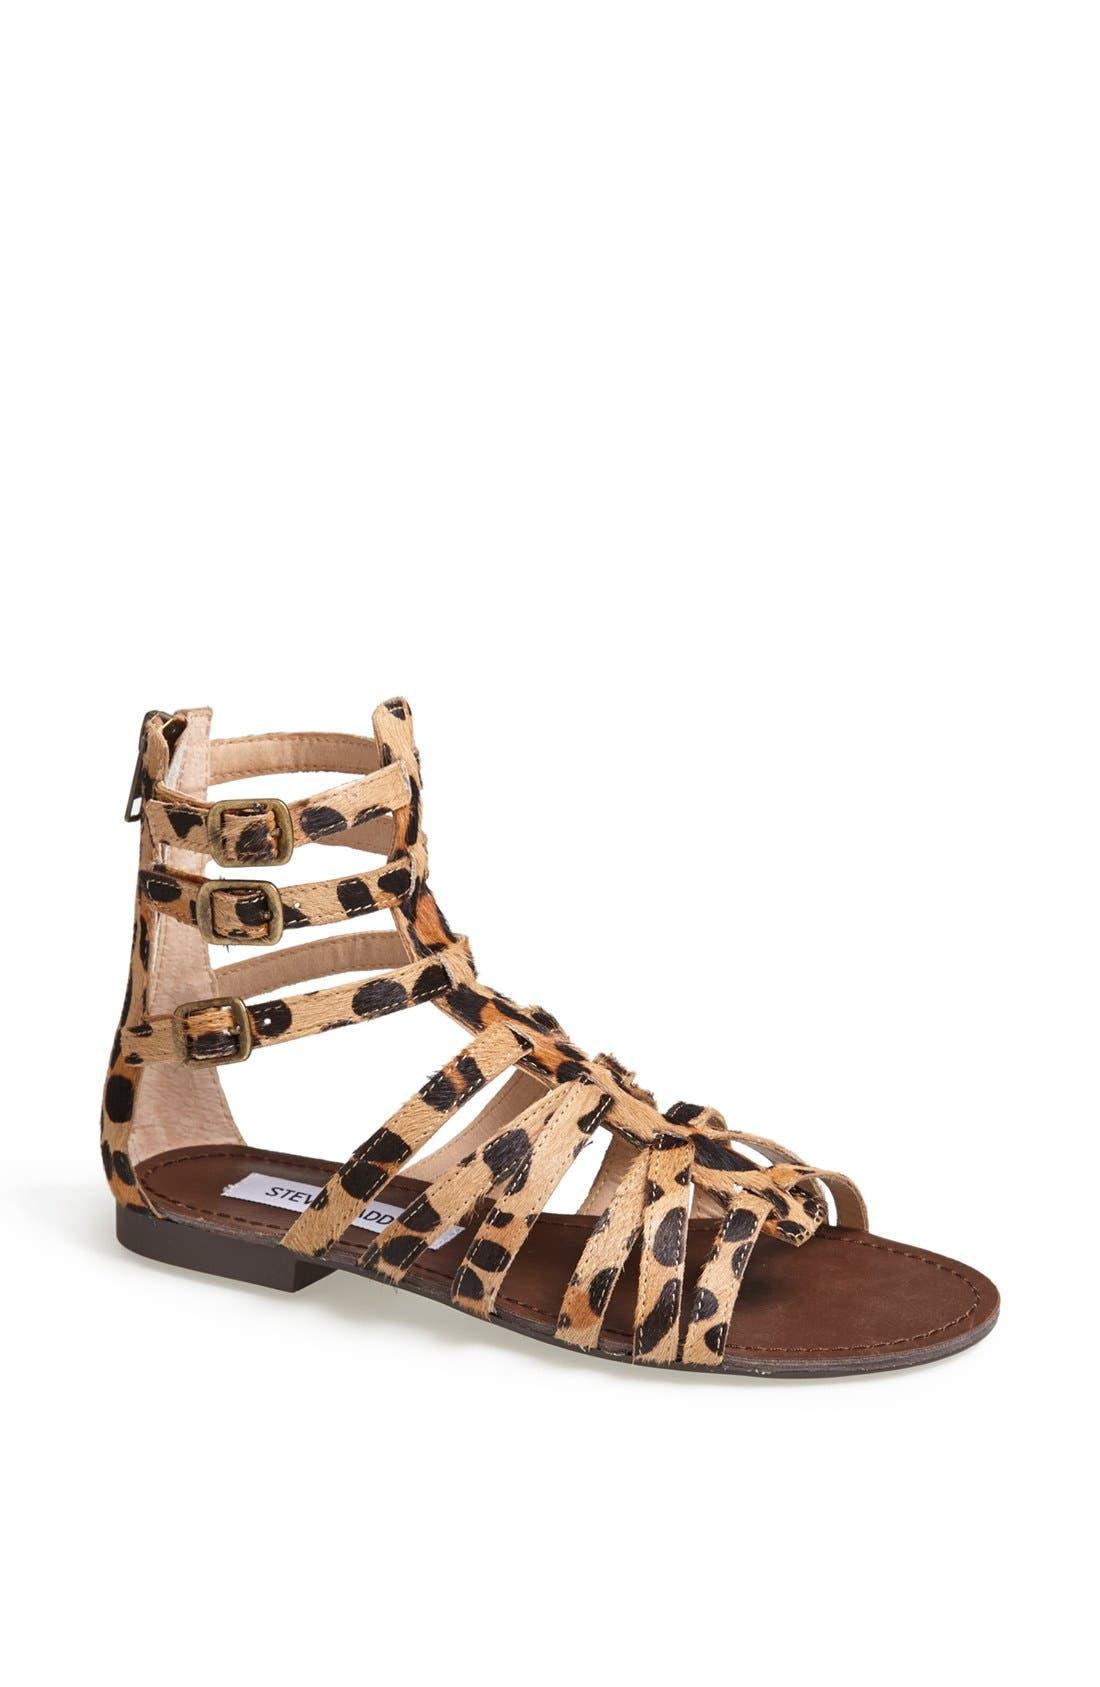 'Plato-S' Sandal,                             Main thumbnail 1, color,                             Leopard Stud